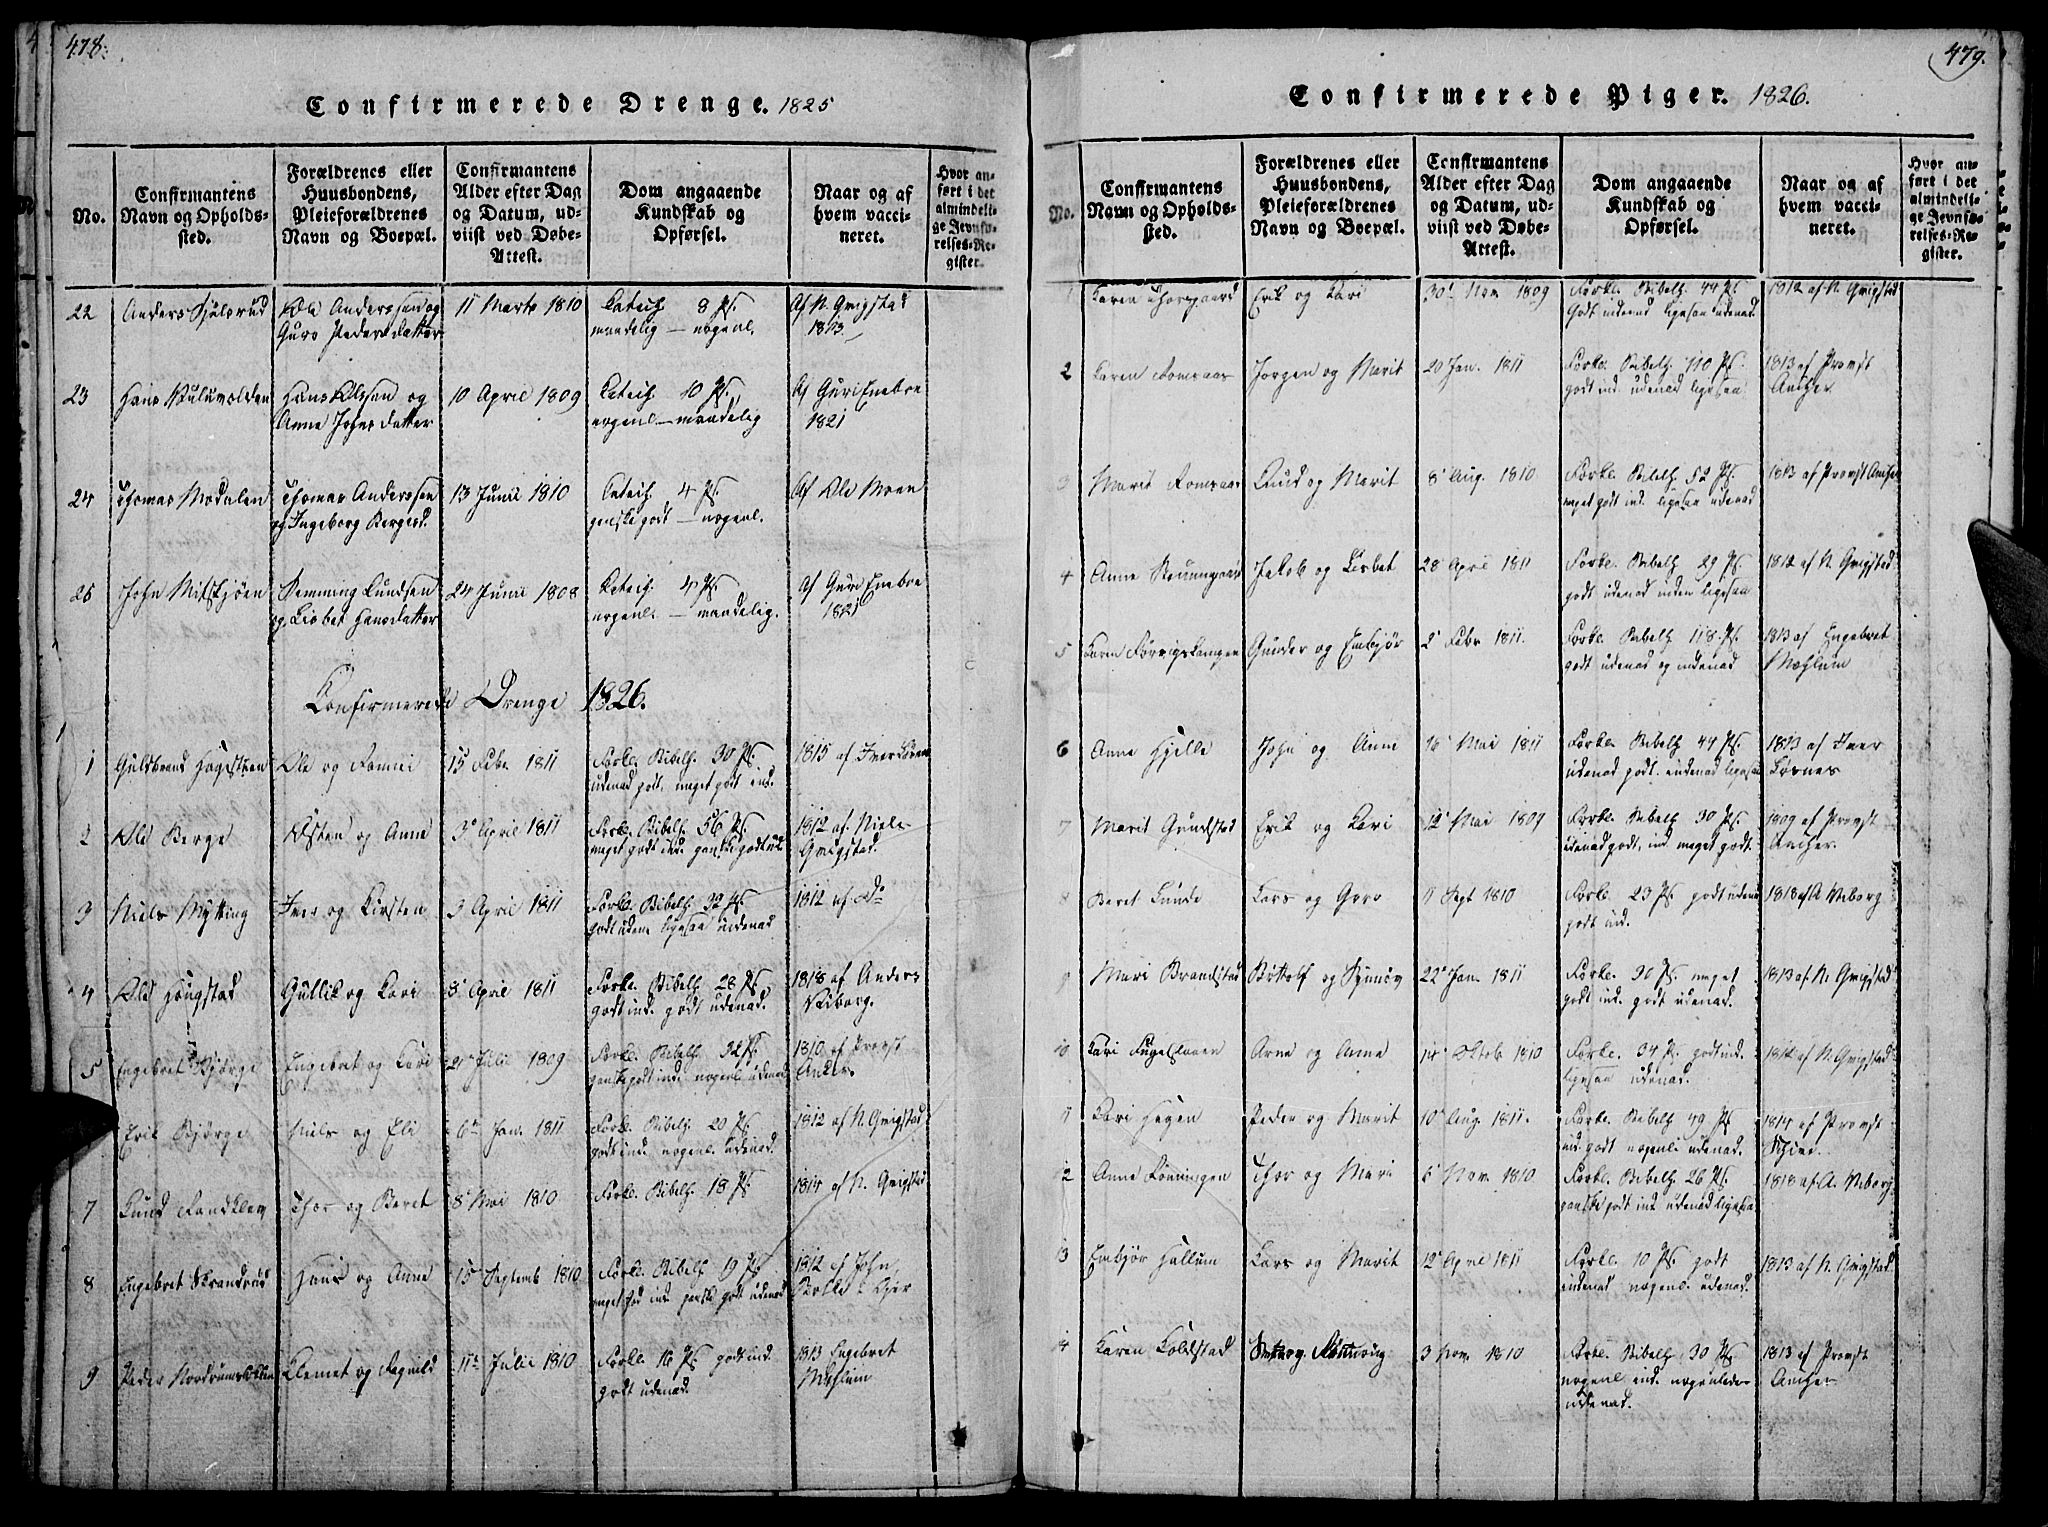 SAH, Ringebu prestekontor, Ministerialbok nr. 4, 1821-1839, s. 478-479